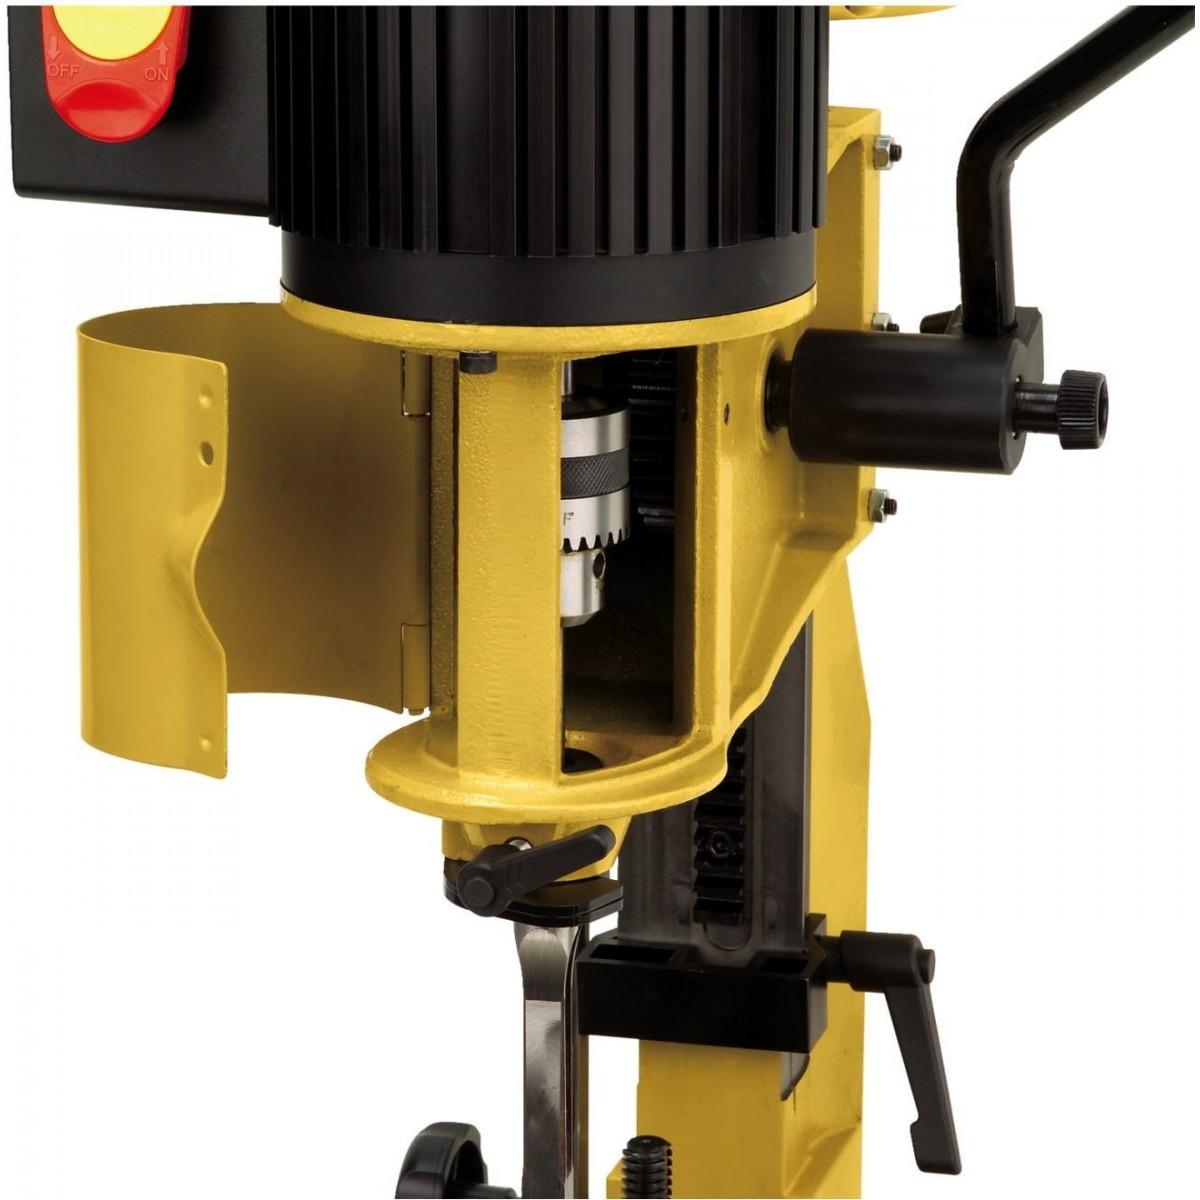 Powermatic 1791310 drill press